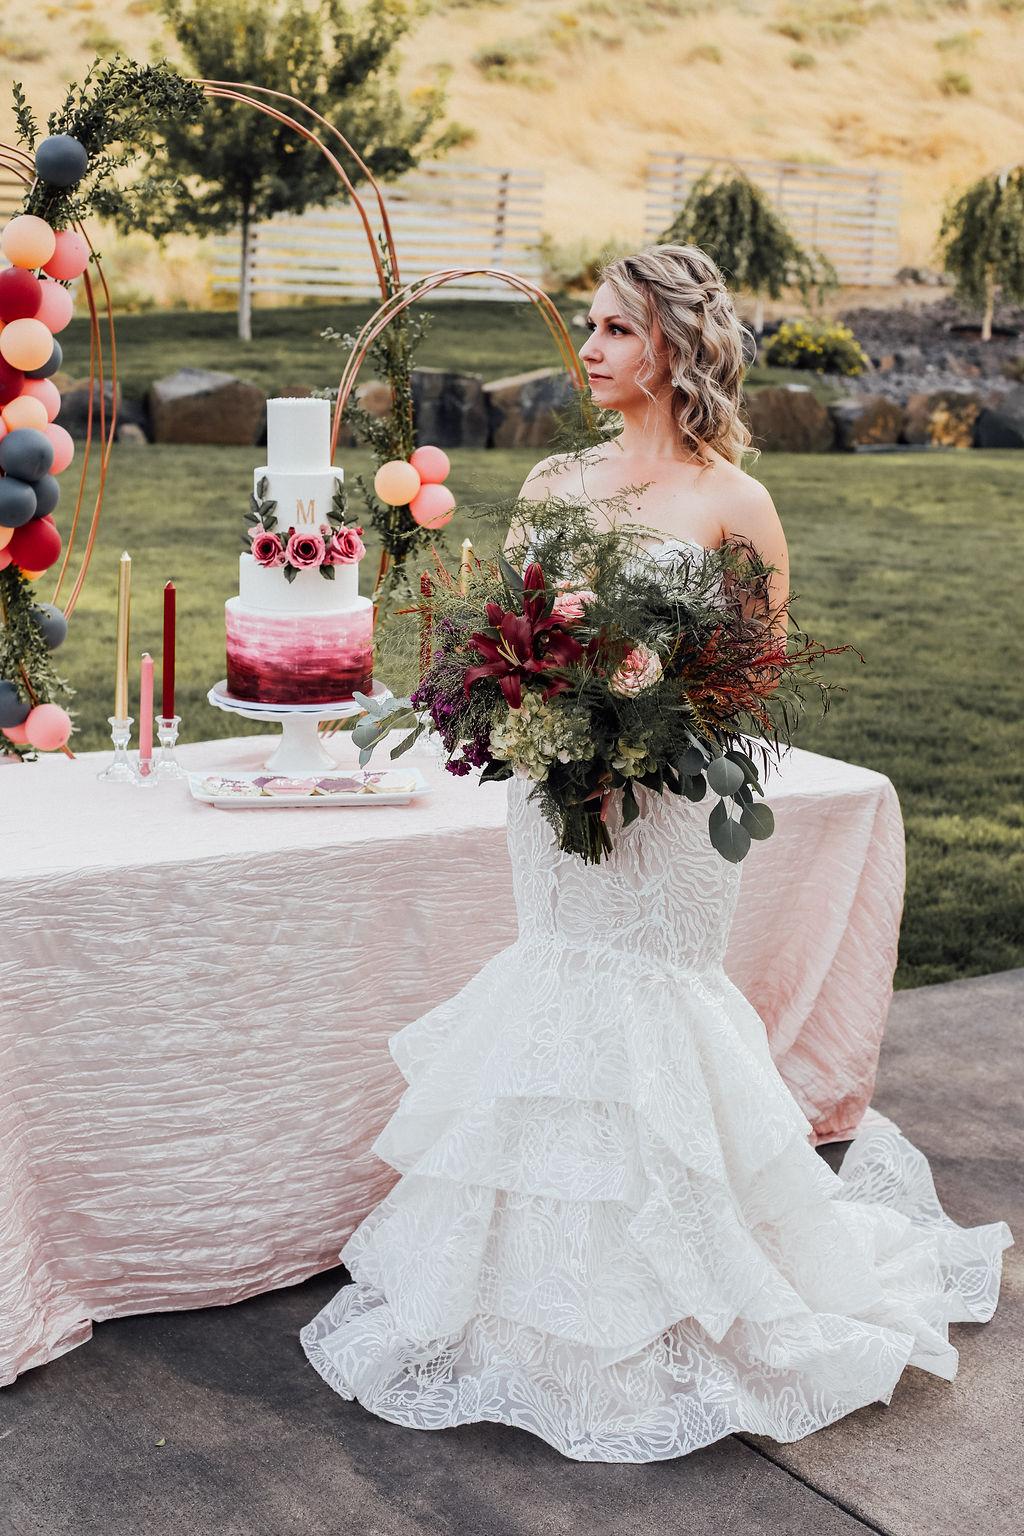 509 Bride_the 509 bride_purple pineapple photography_13